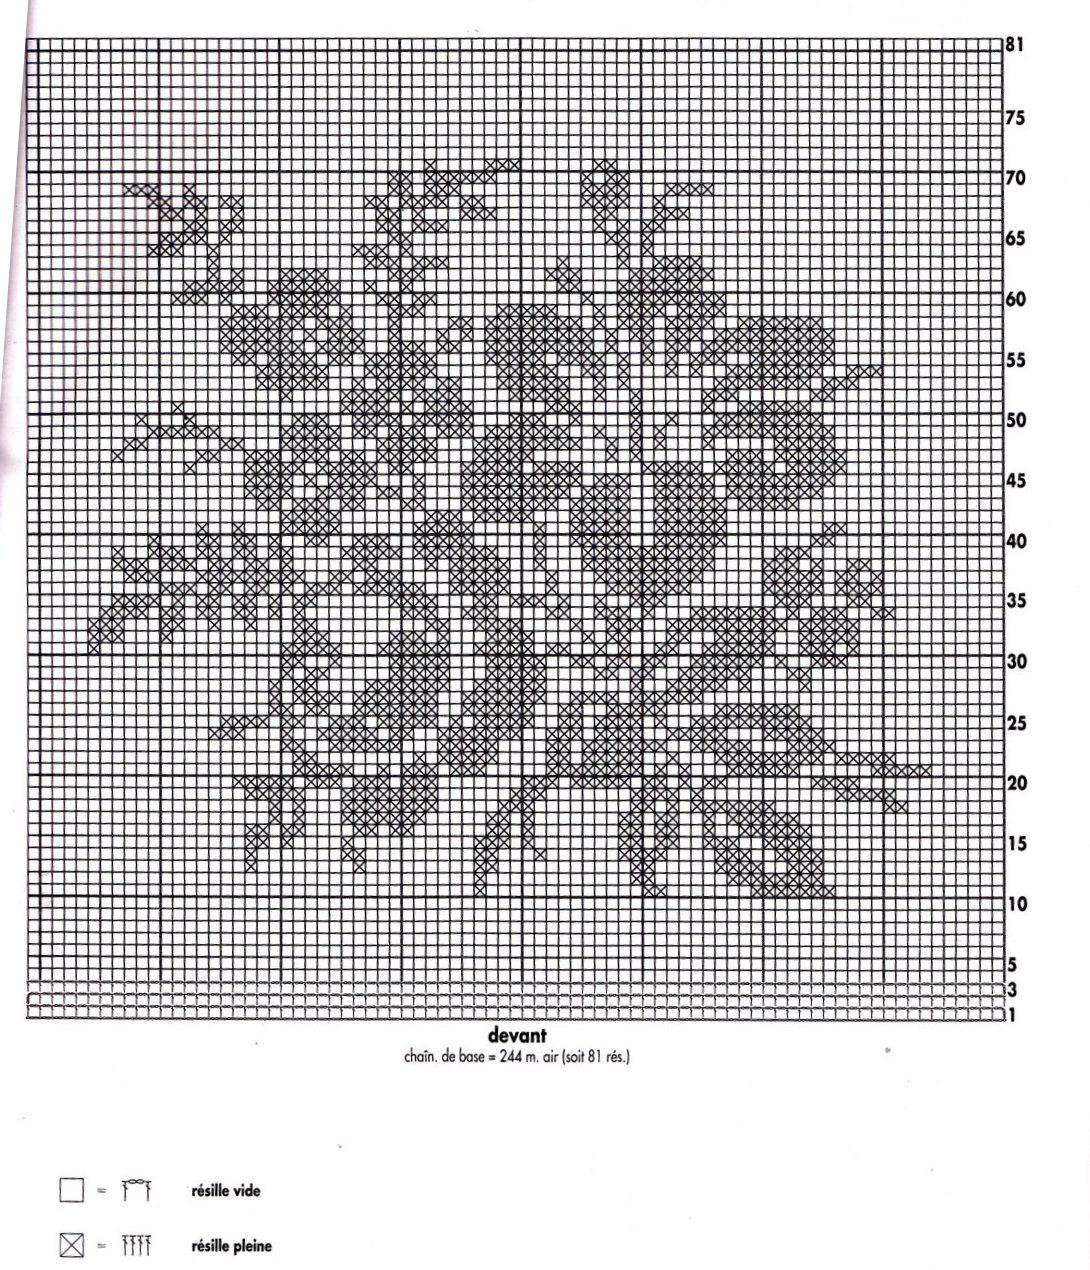 Ergahandmade crochet filet pillow diagrams httpergahandmadespot201506crochet stitchesml via httpliveinternetuserslarka77post226573883 ccuart Gallery